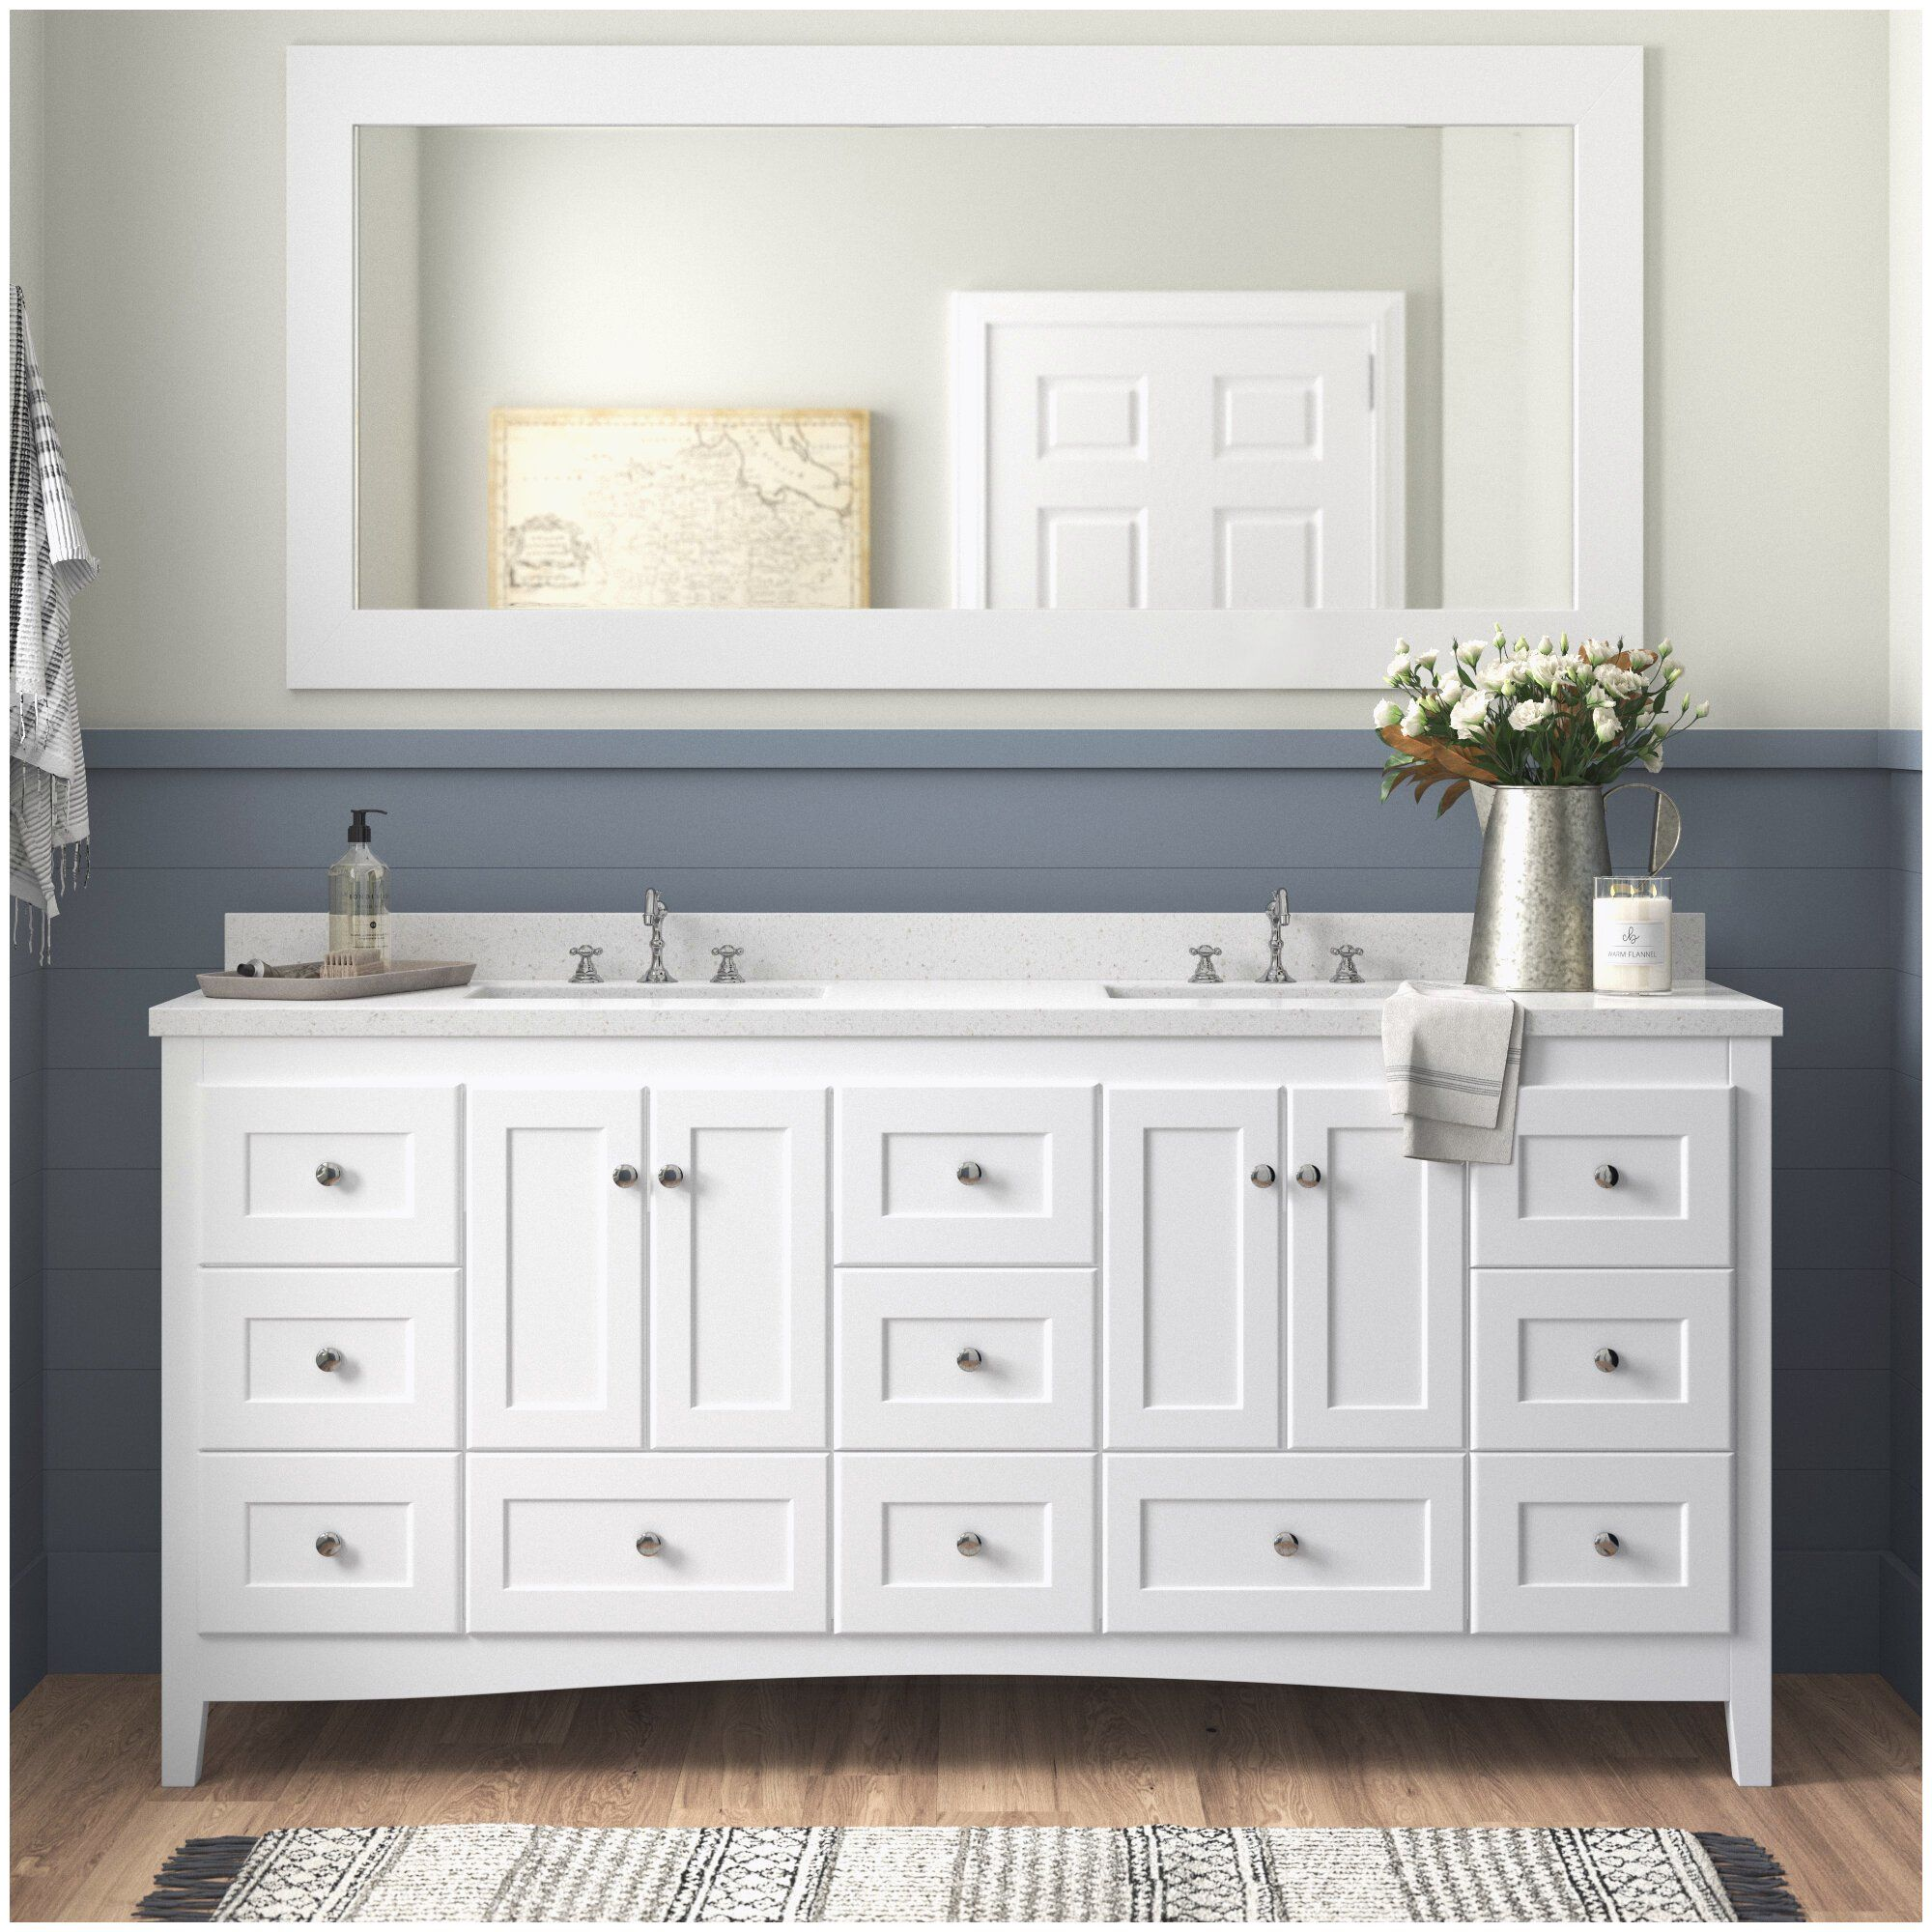 Abbey 72 Double Bathroom Vanity Set Cheap Bathroom Vanities With Sink Of Bathroom Vanities In 2020 Double Vanity Bathroom Cheap Bathroom Vanities Bathroom Sink Vanity